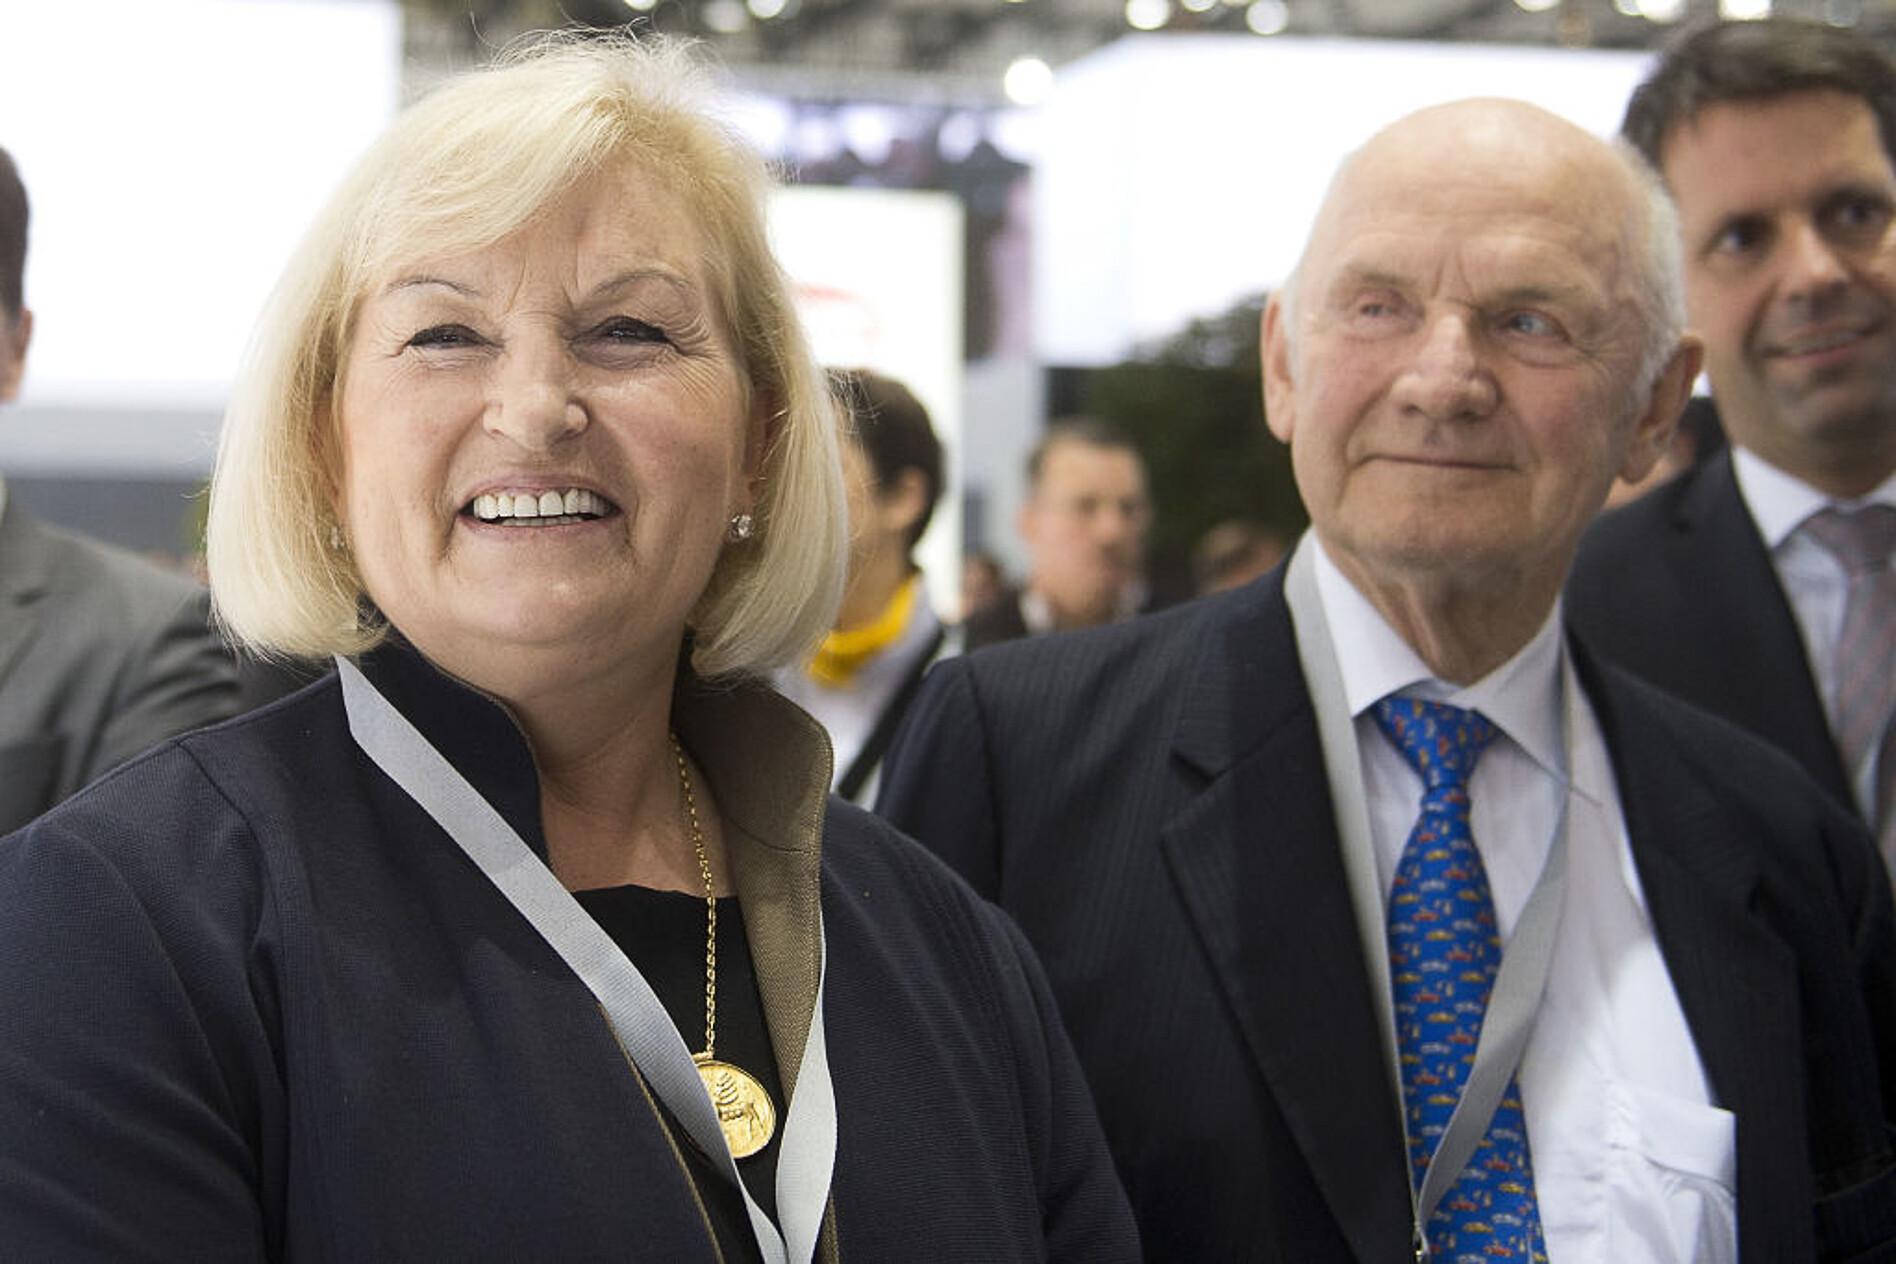 Ferdinand Piech and wife Ursula